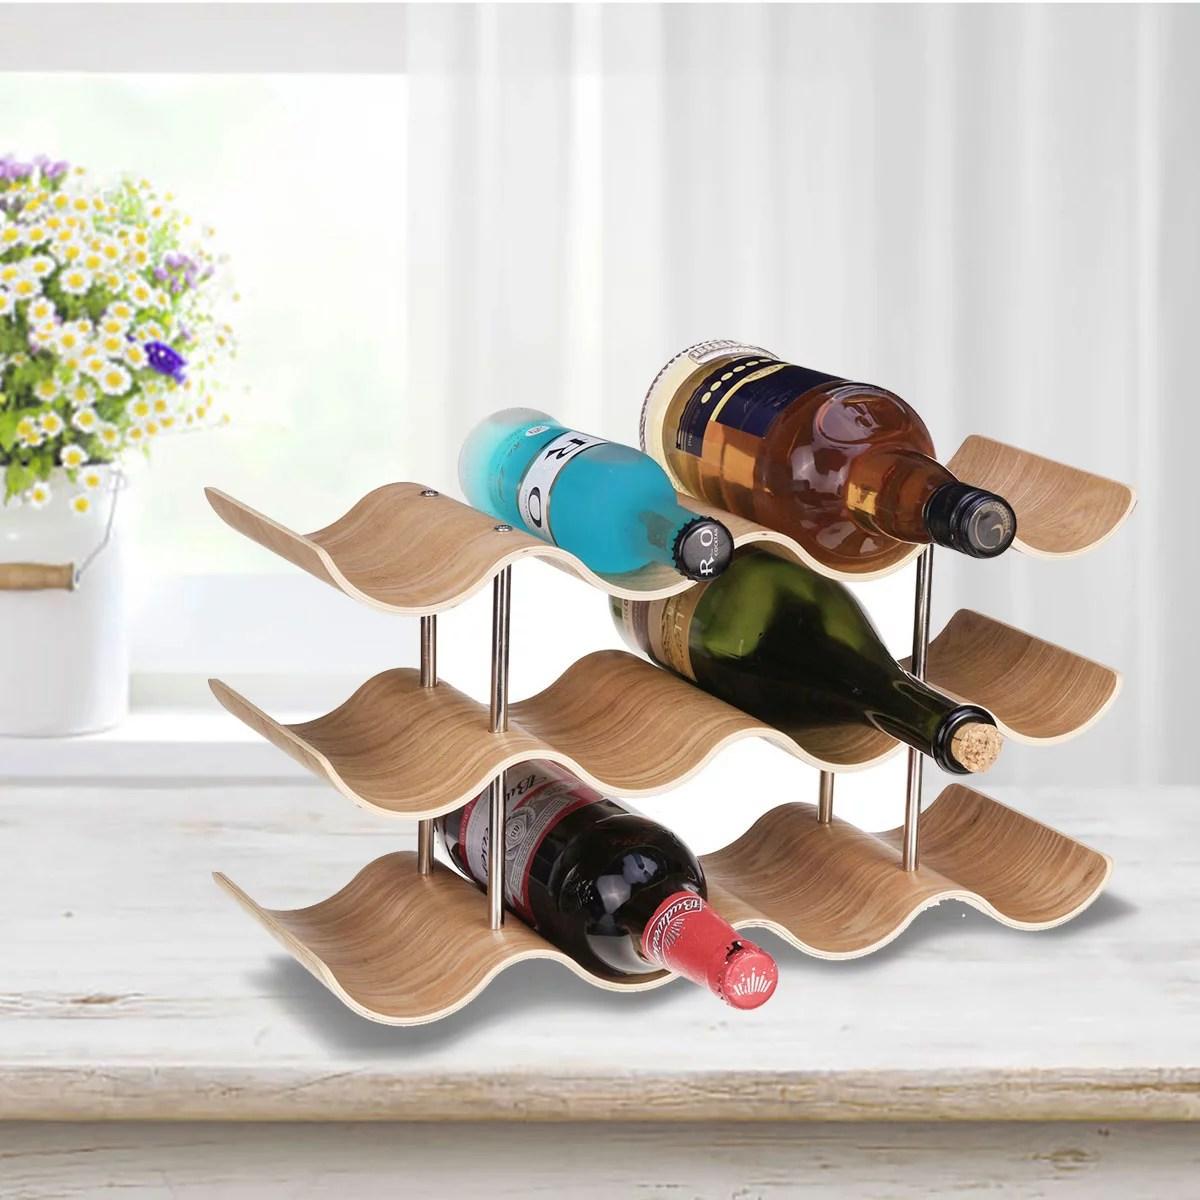 3 4 tier wine rack holder household wine bottle rack creative storage rack display stand countertop kitchen cabinet